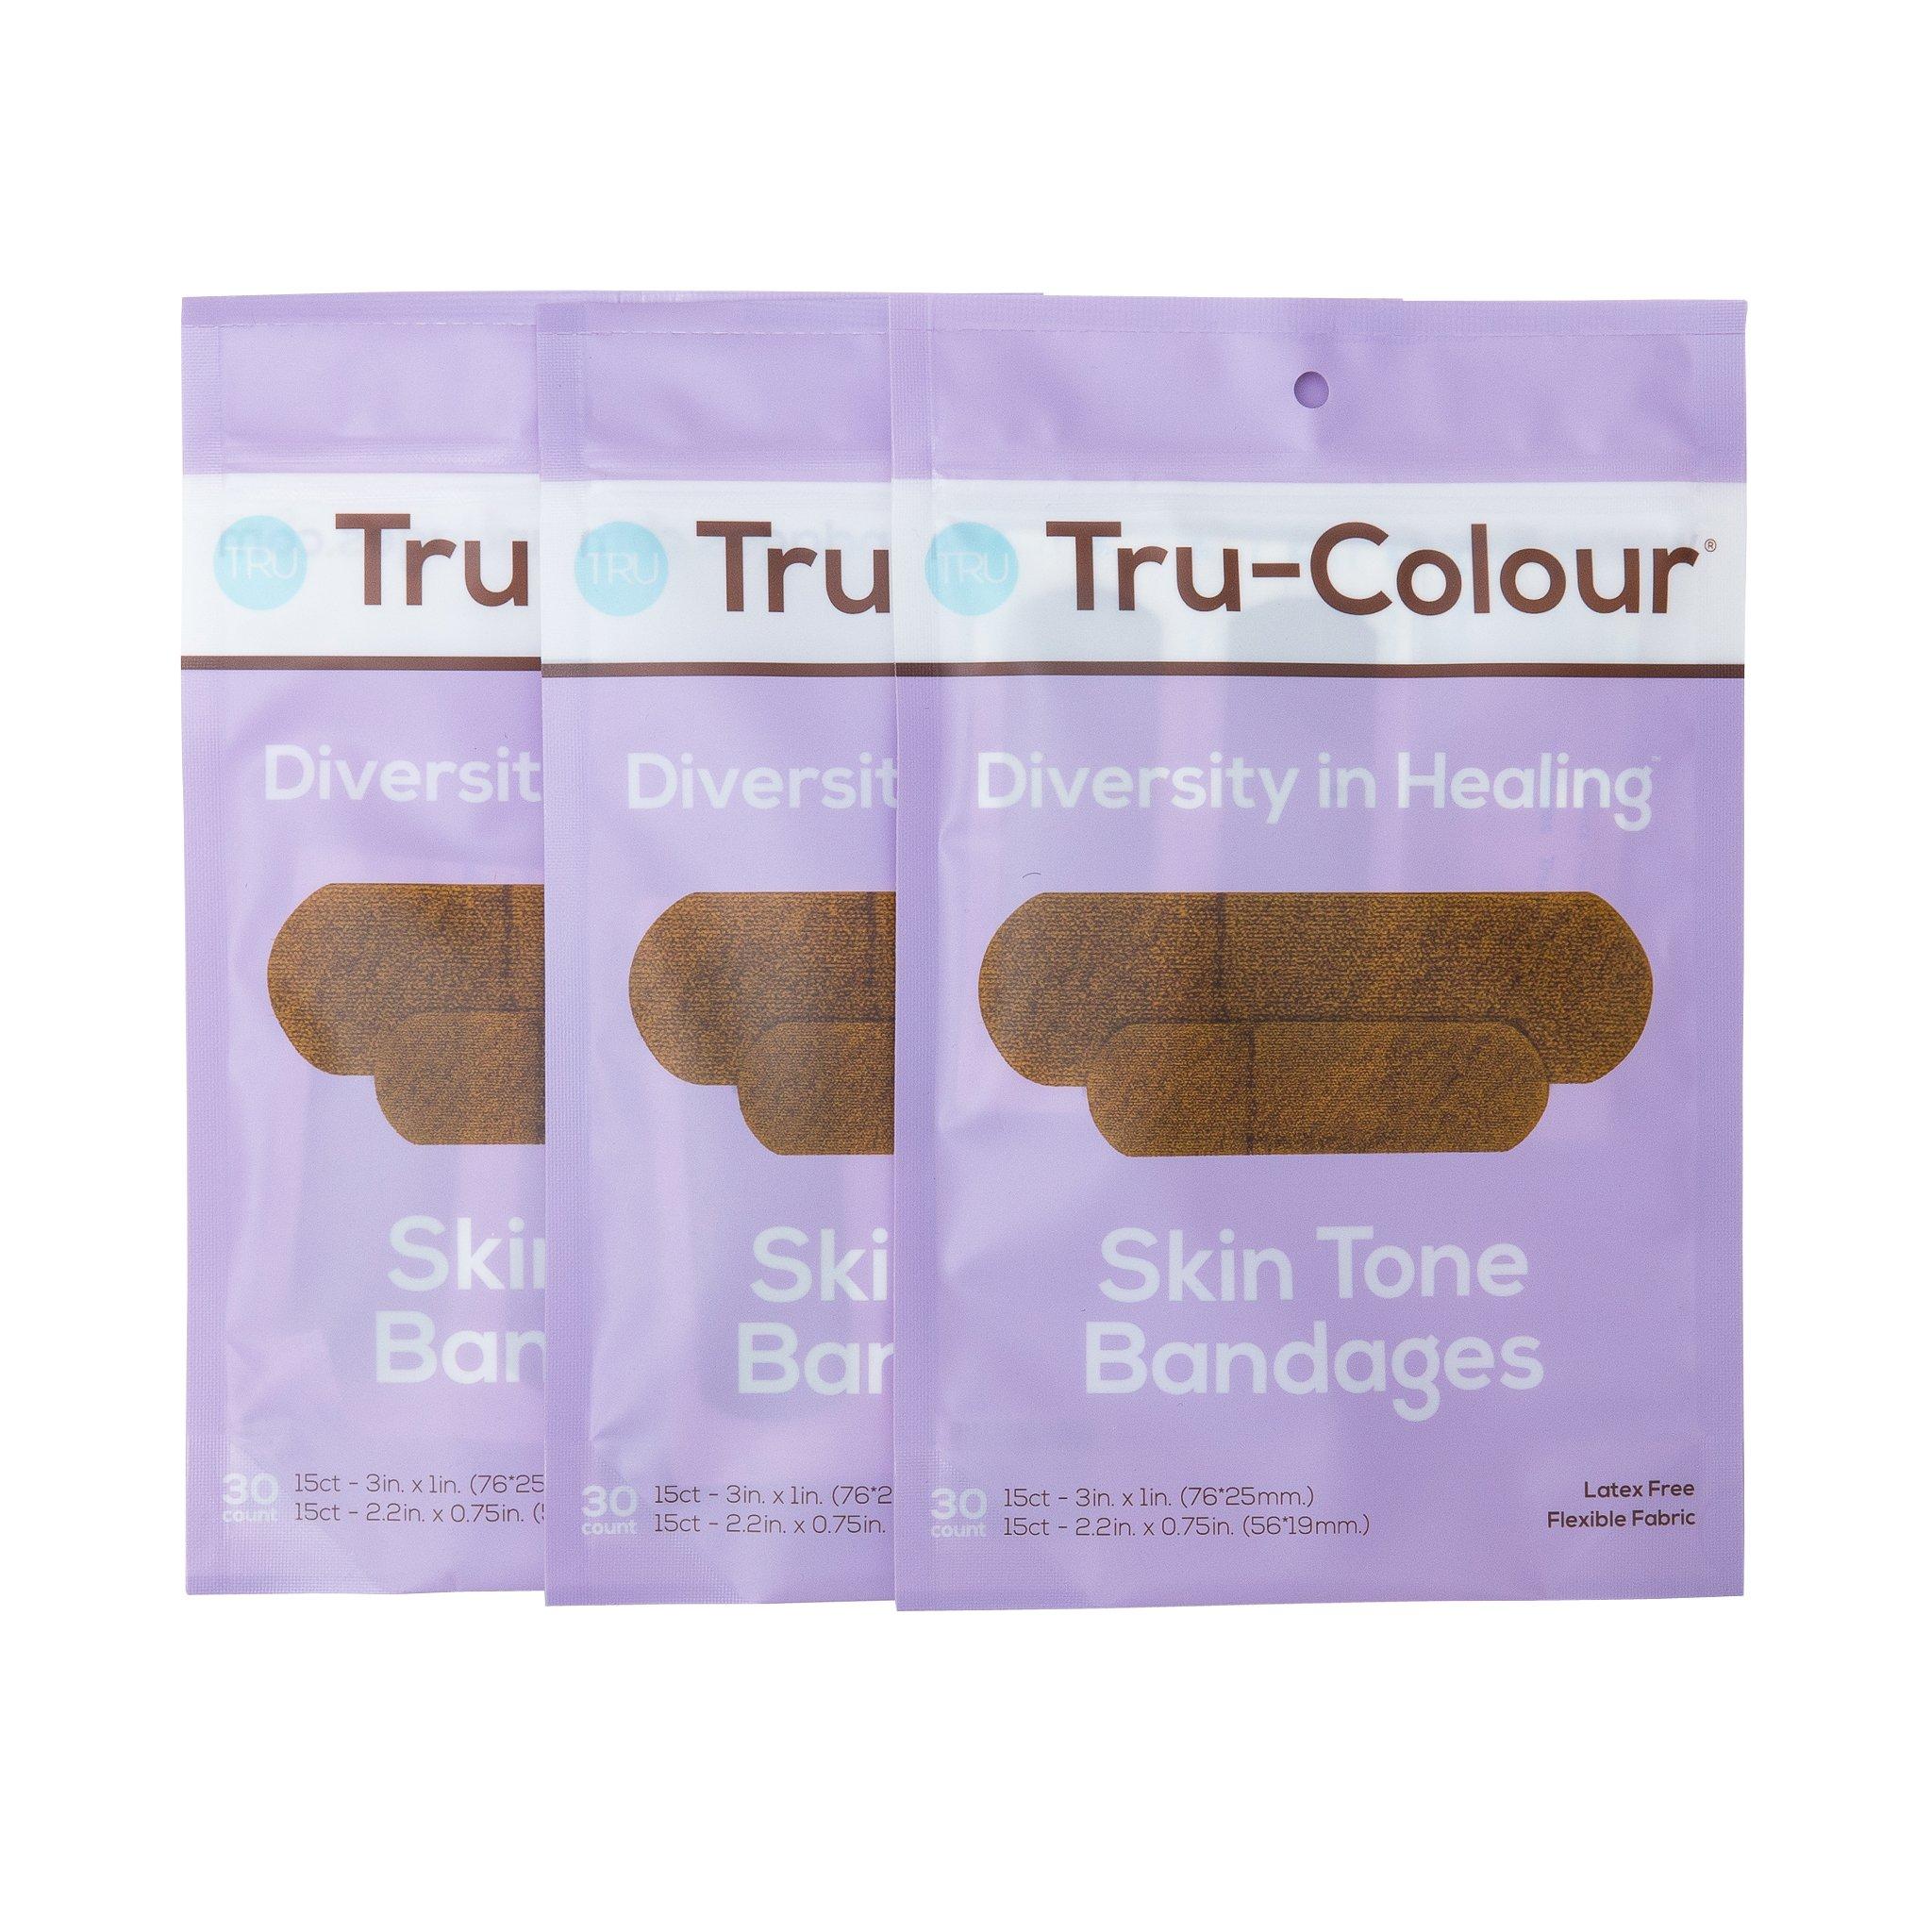 Tru-Colour Bandages Skin Tone Flexible Fabric Bandages (Purple Bag) - 3 Pack (90 Count)